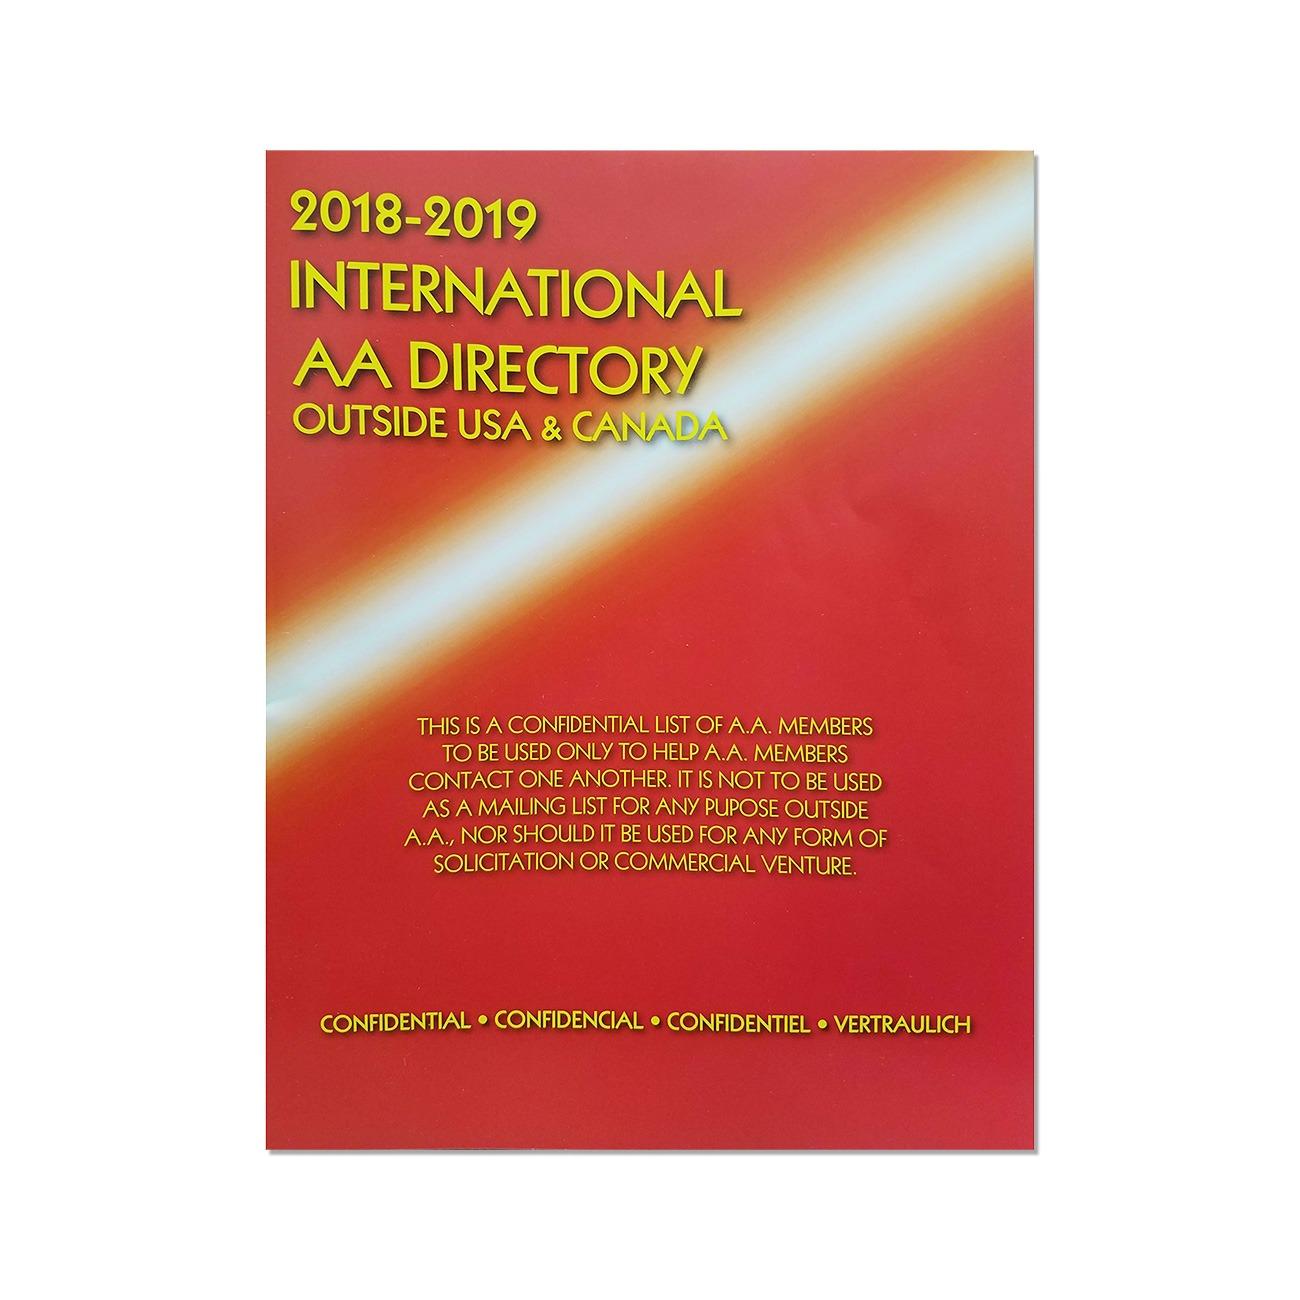 International AA Directory*